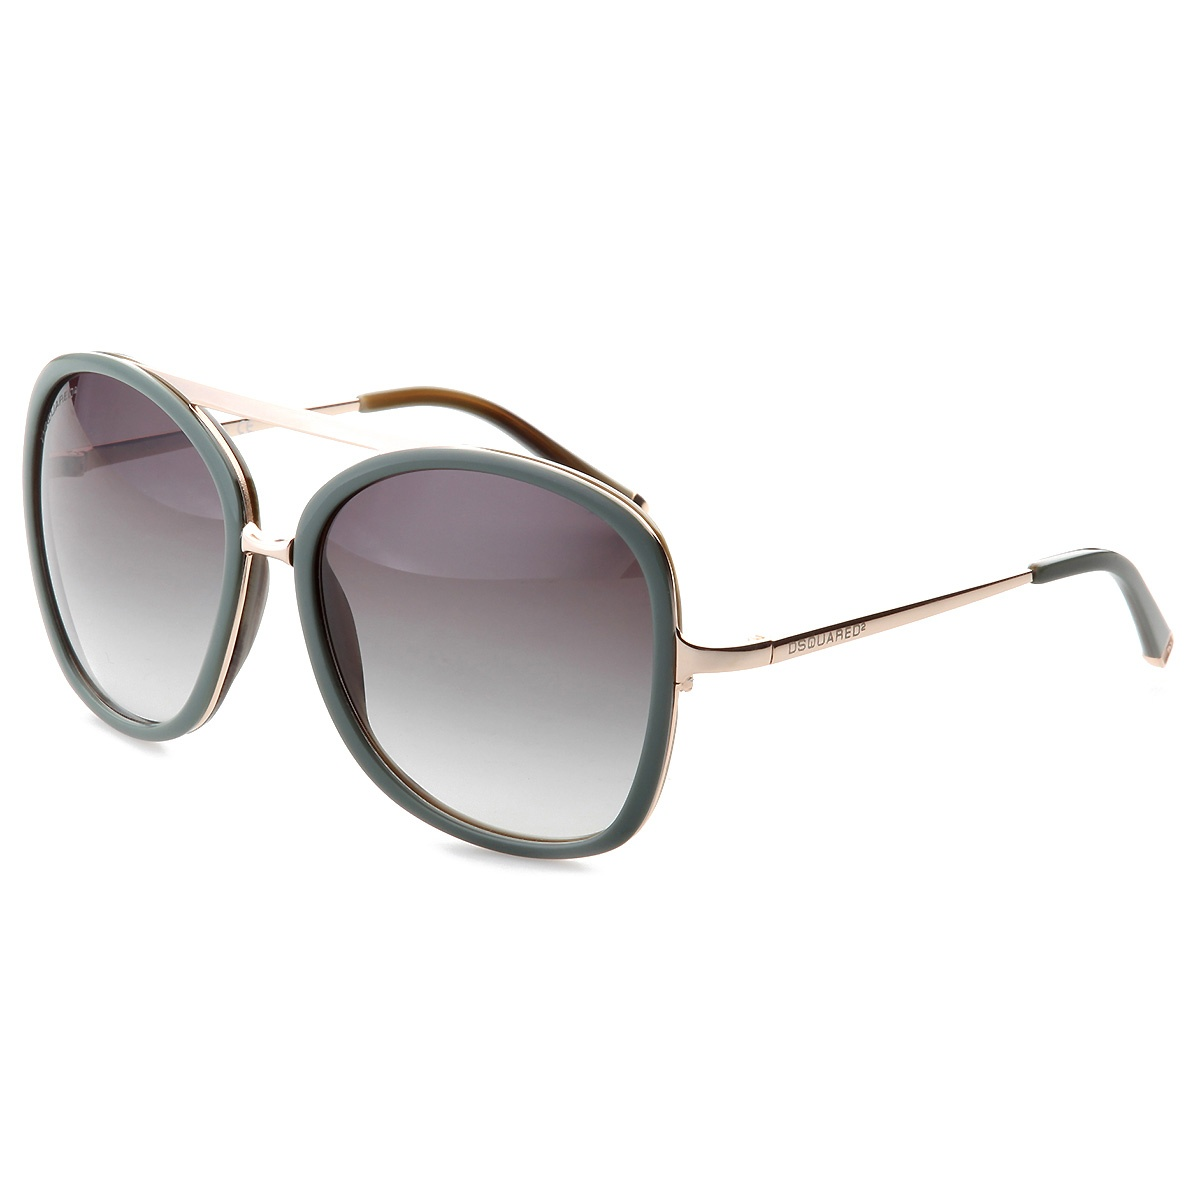 DSQUARED2 Sonnenbrille Damen exlUScTKn